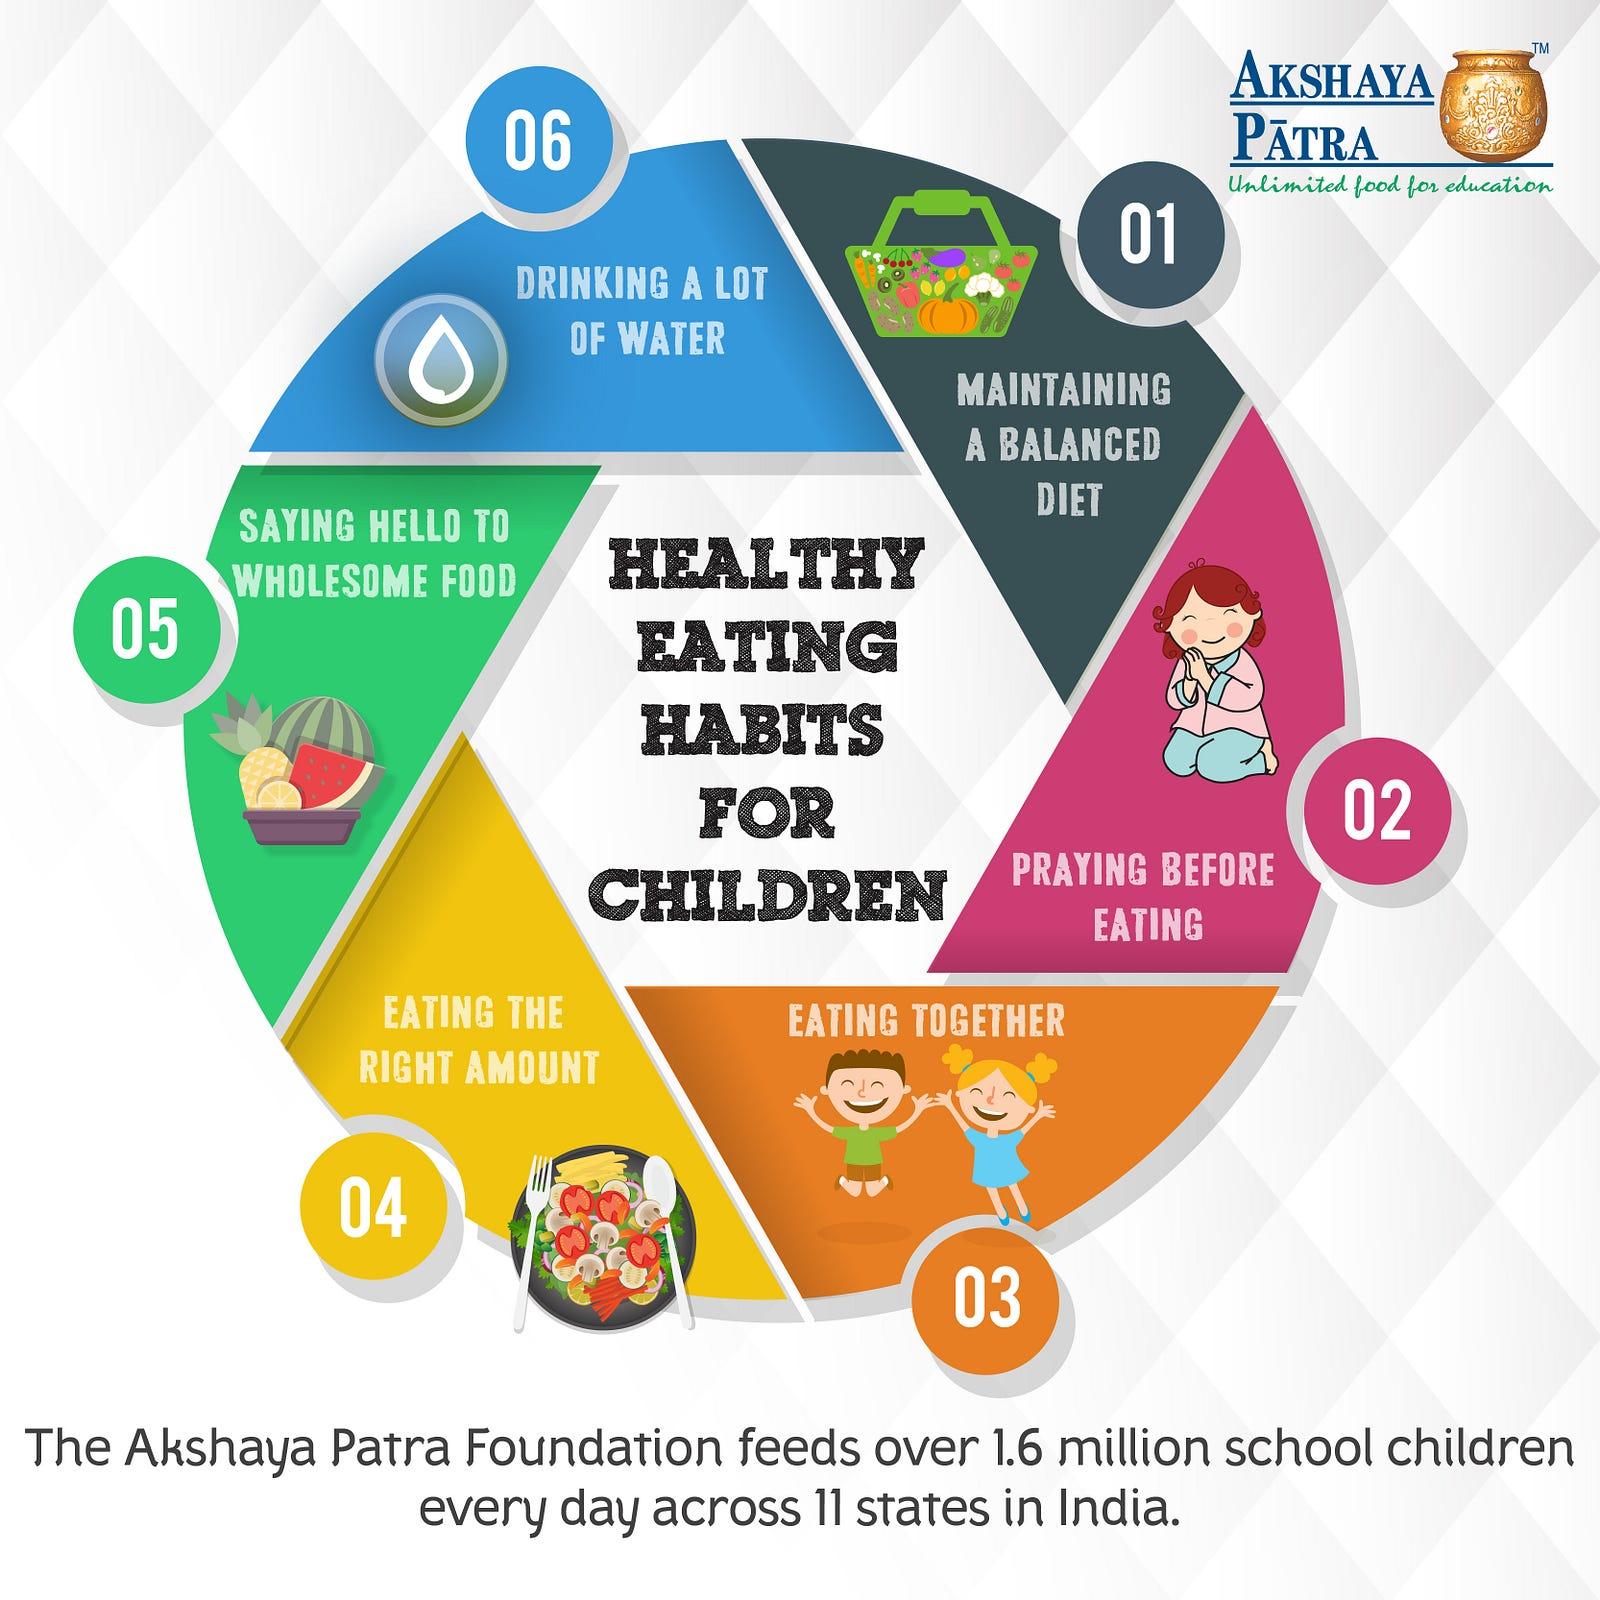 10 Healthy Eating Habits For Children By Akshaya Patra